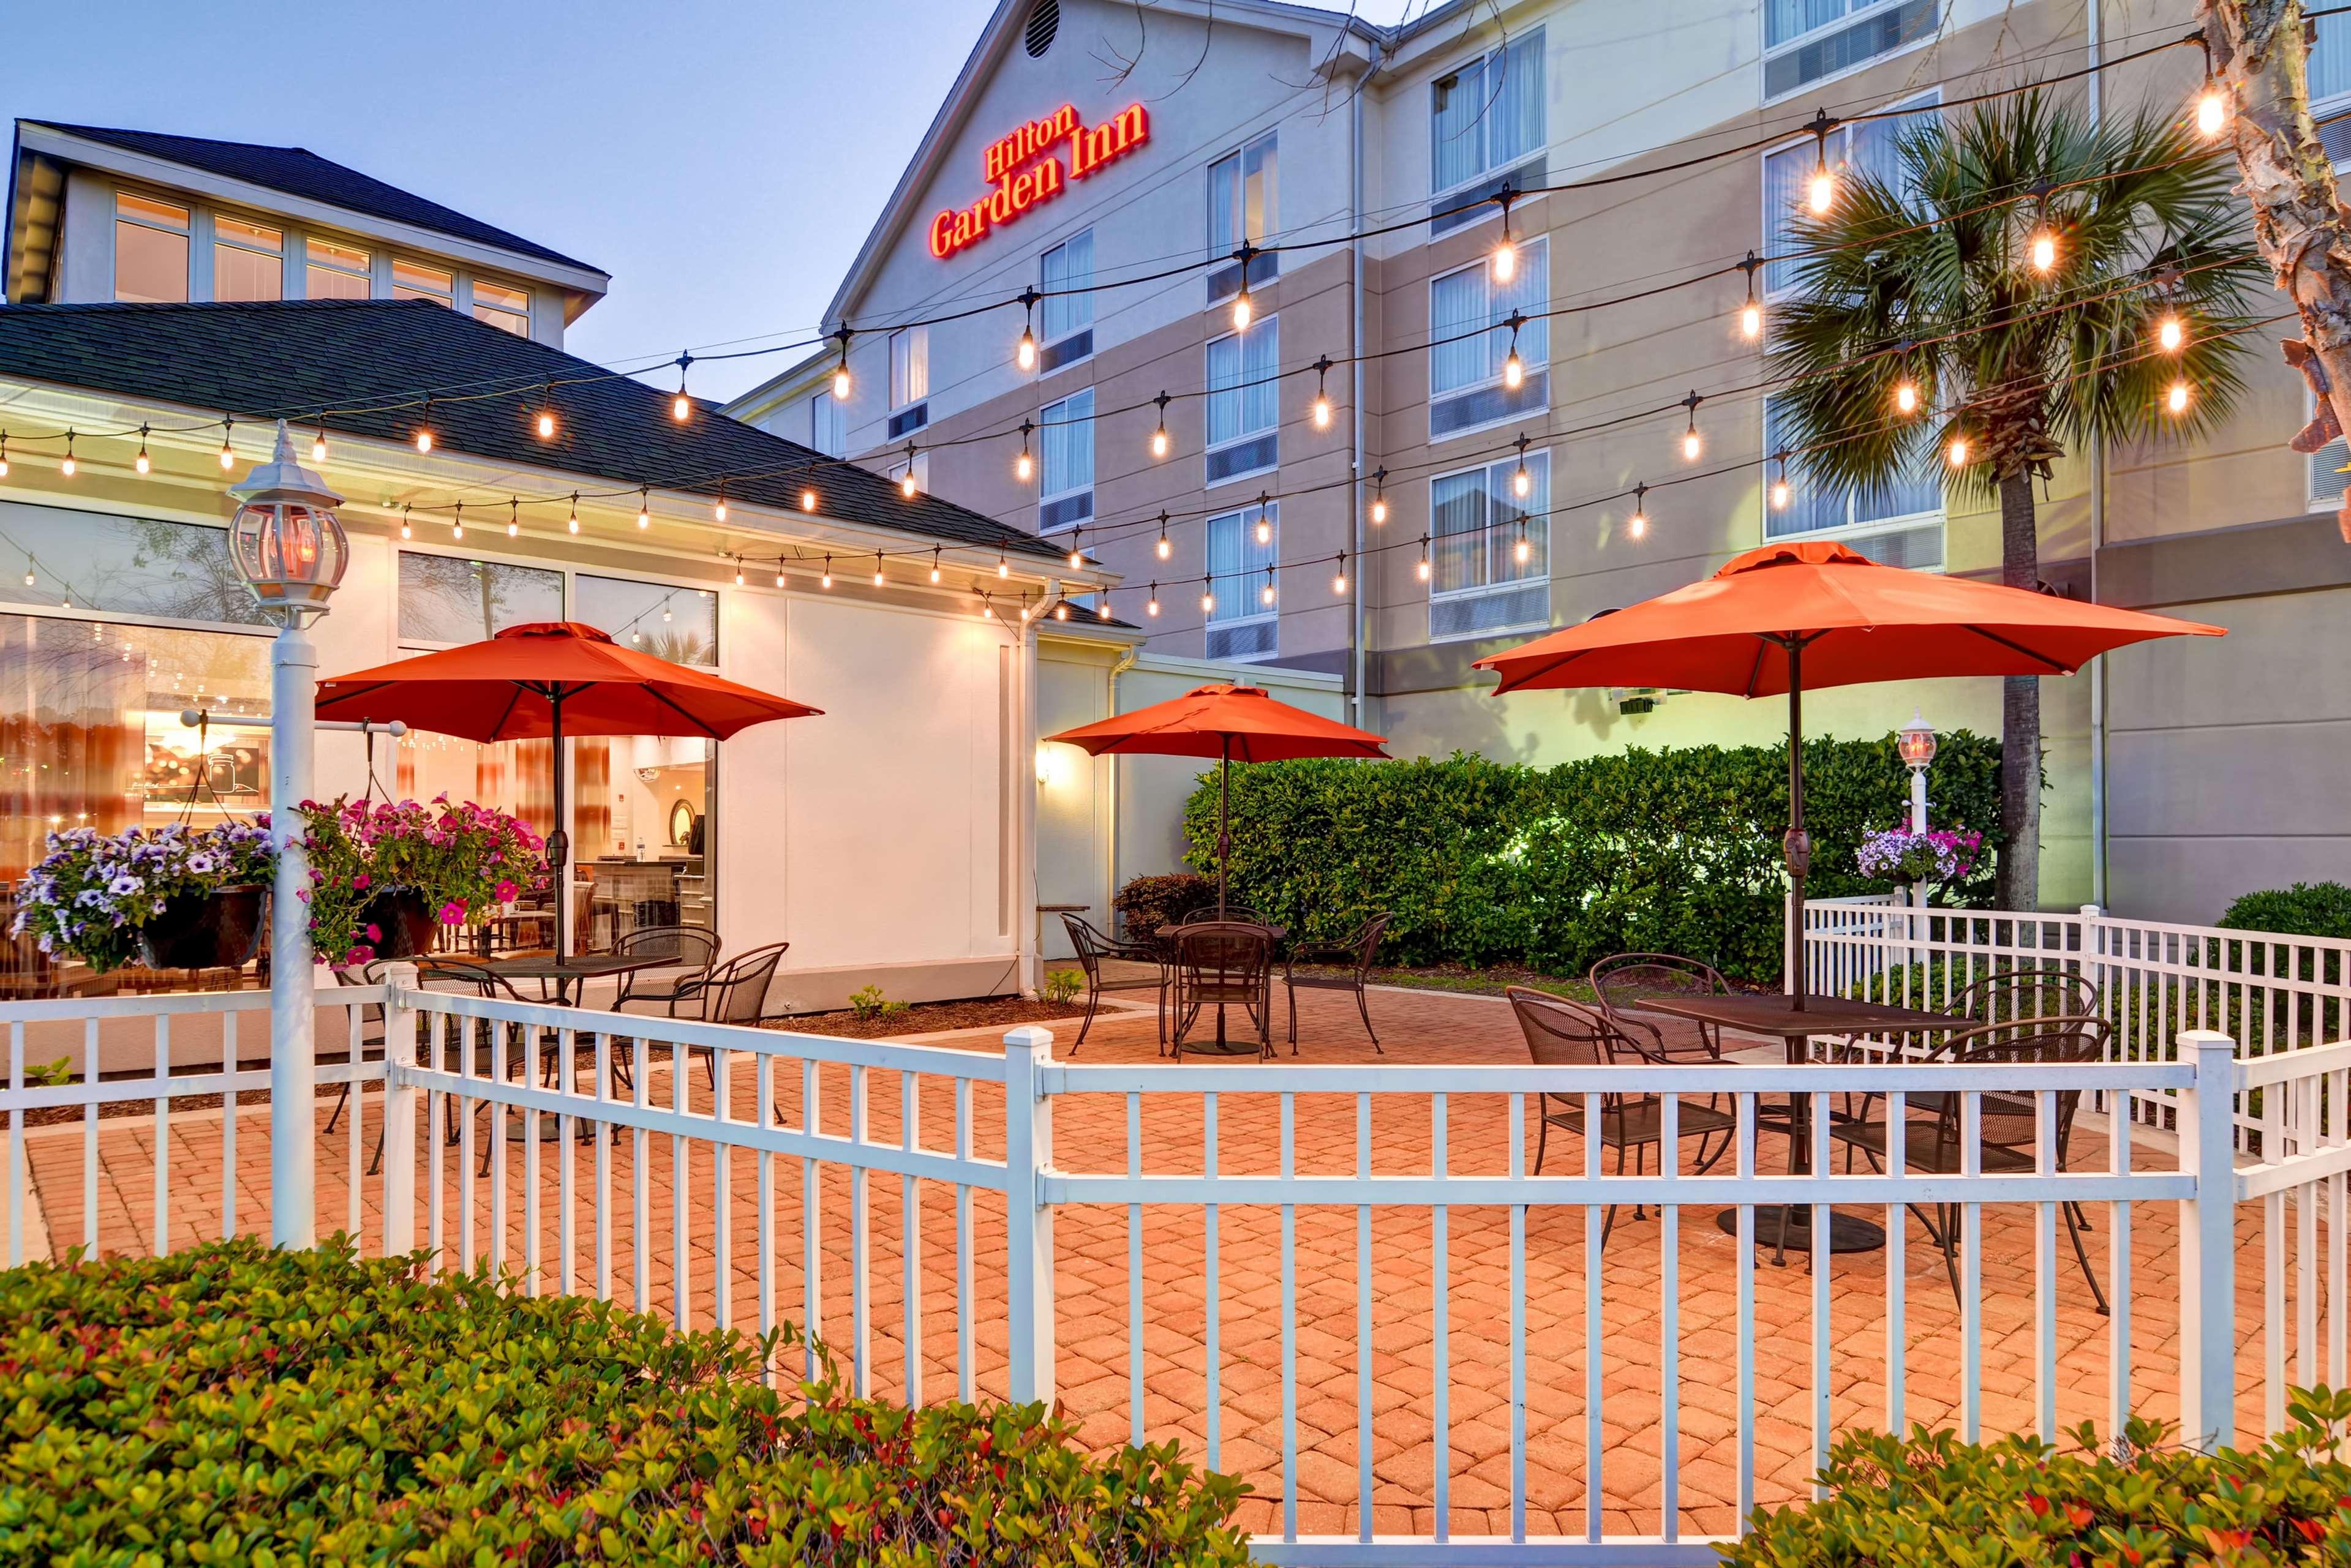 Hilton Garden Inn Panama City image 1